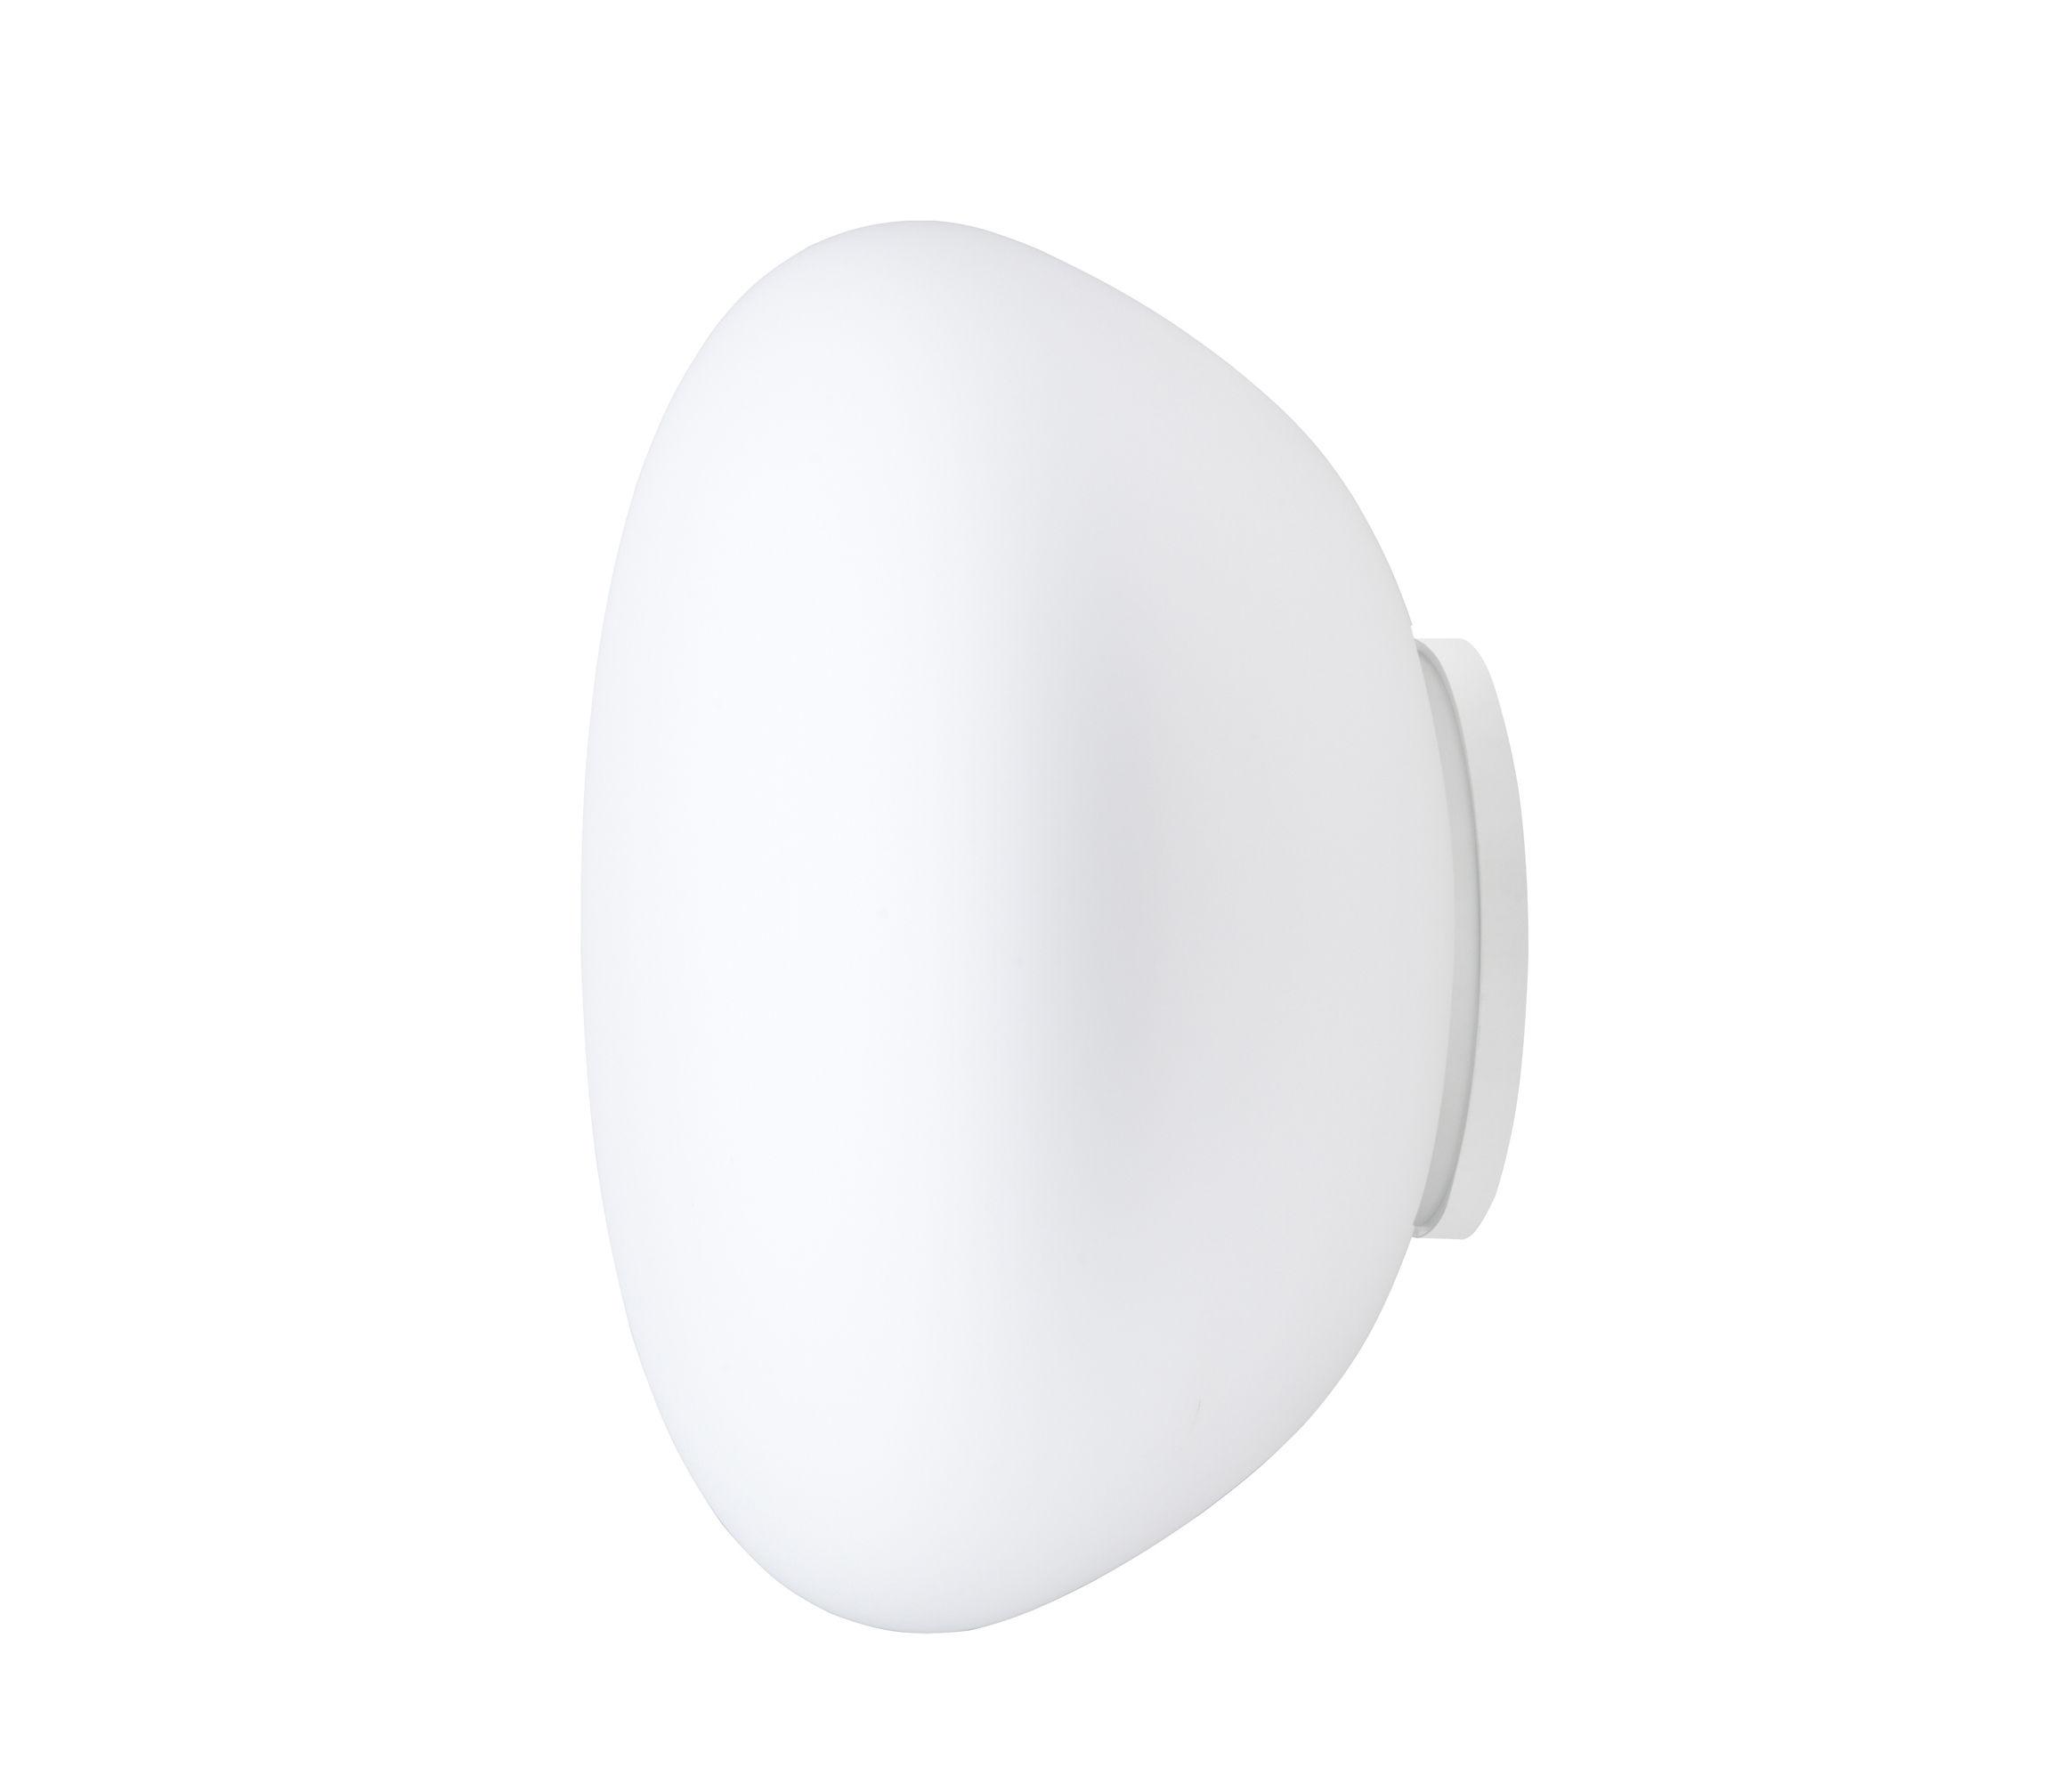 Lighting - Wall Lights - Poga Wall light - Ø 42 cm by Fabbian - White - Glass